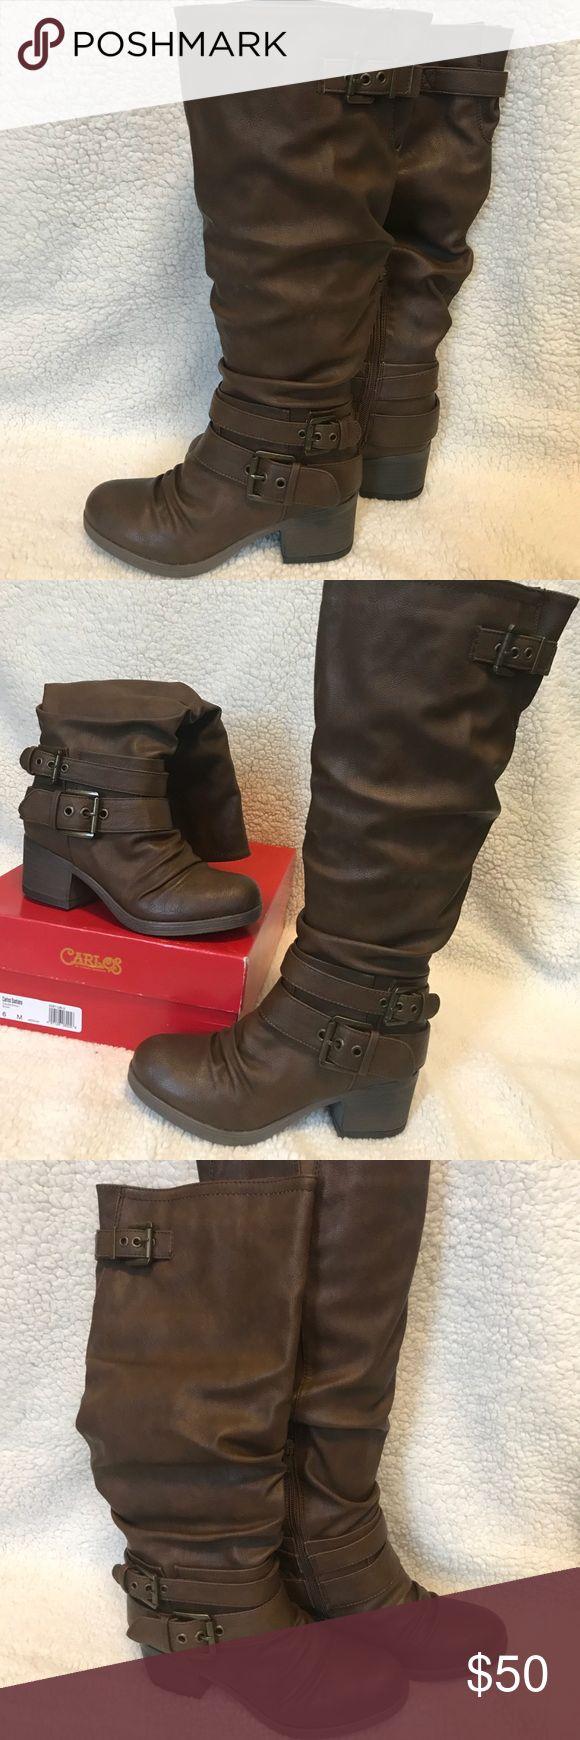 Carlos Santana Boots BNIB brown vegan leather slouchy boots from Carlos Santana.  Three buckle detail. Two inch heel.  Size 6 M Carlos Santana Shoes Heeled Boots